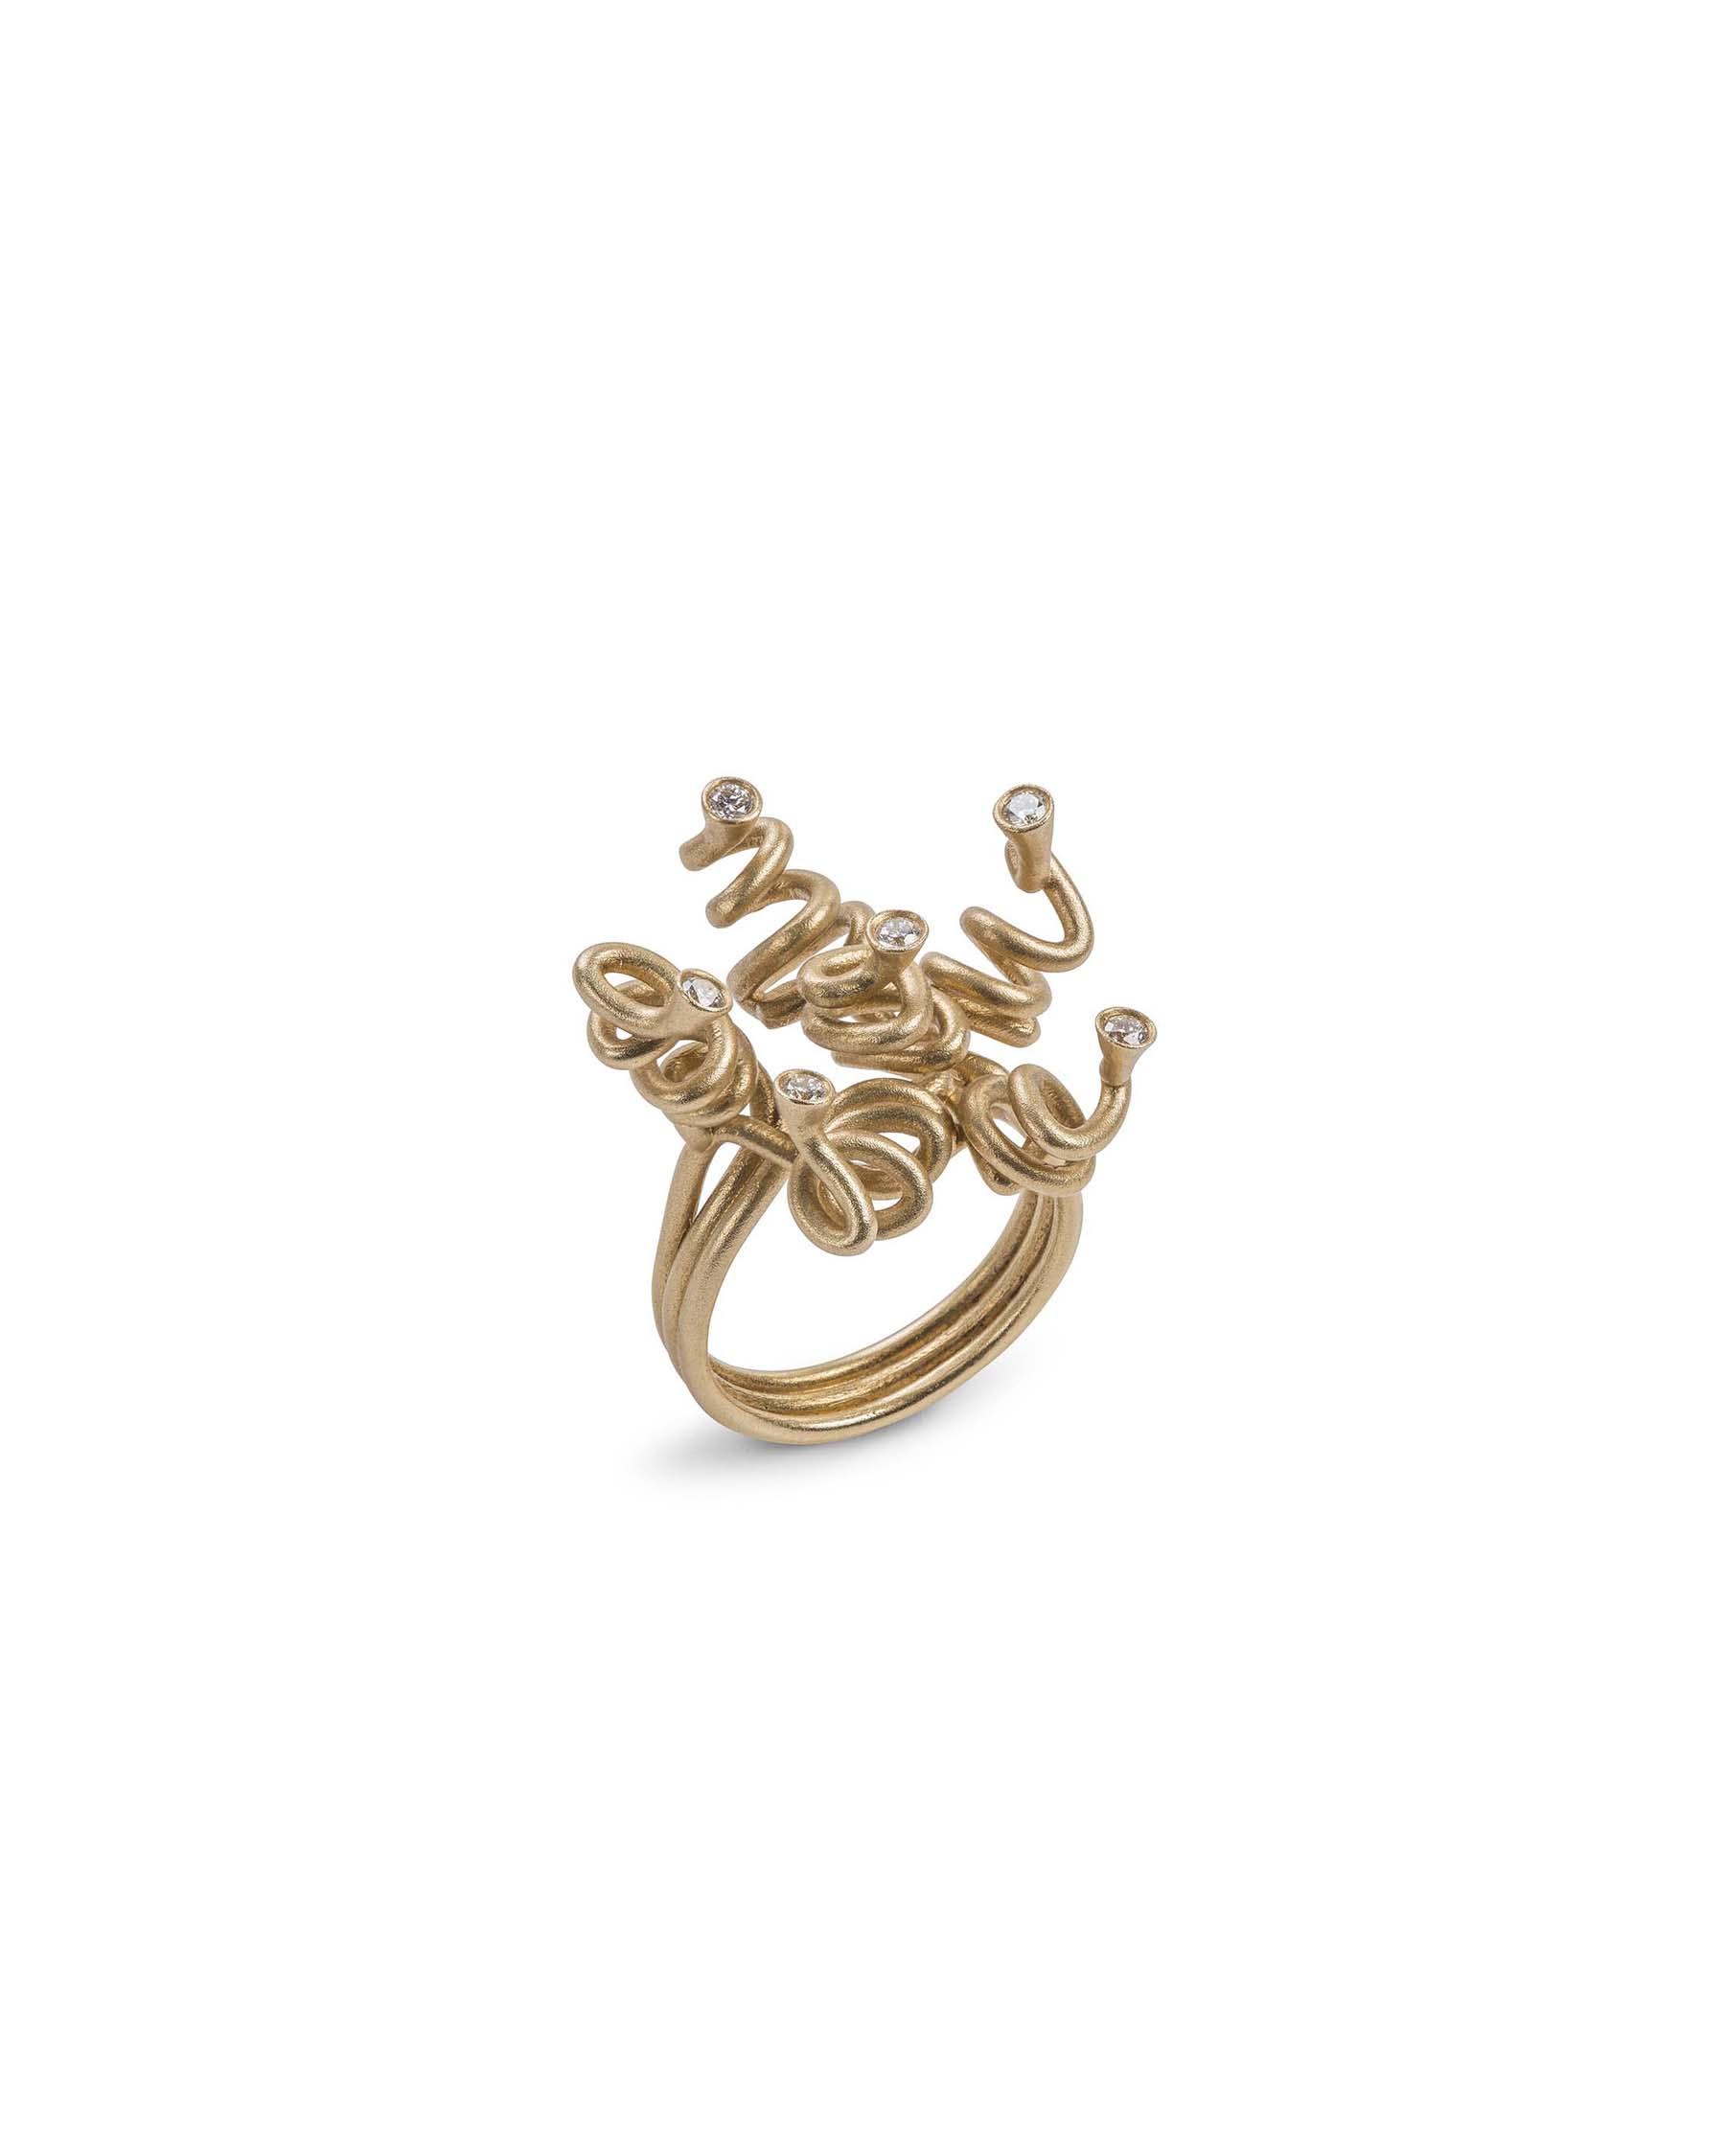 Gold ringlet knot ring